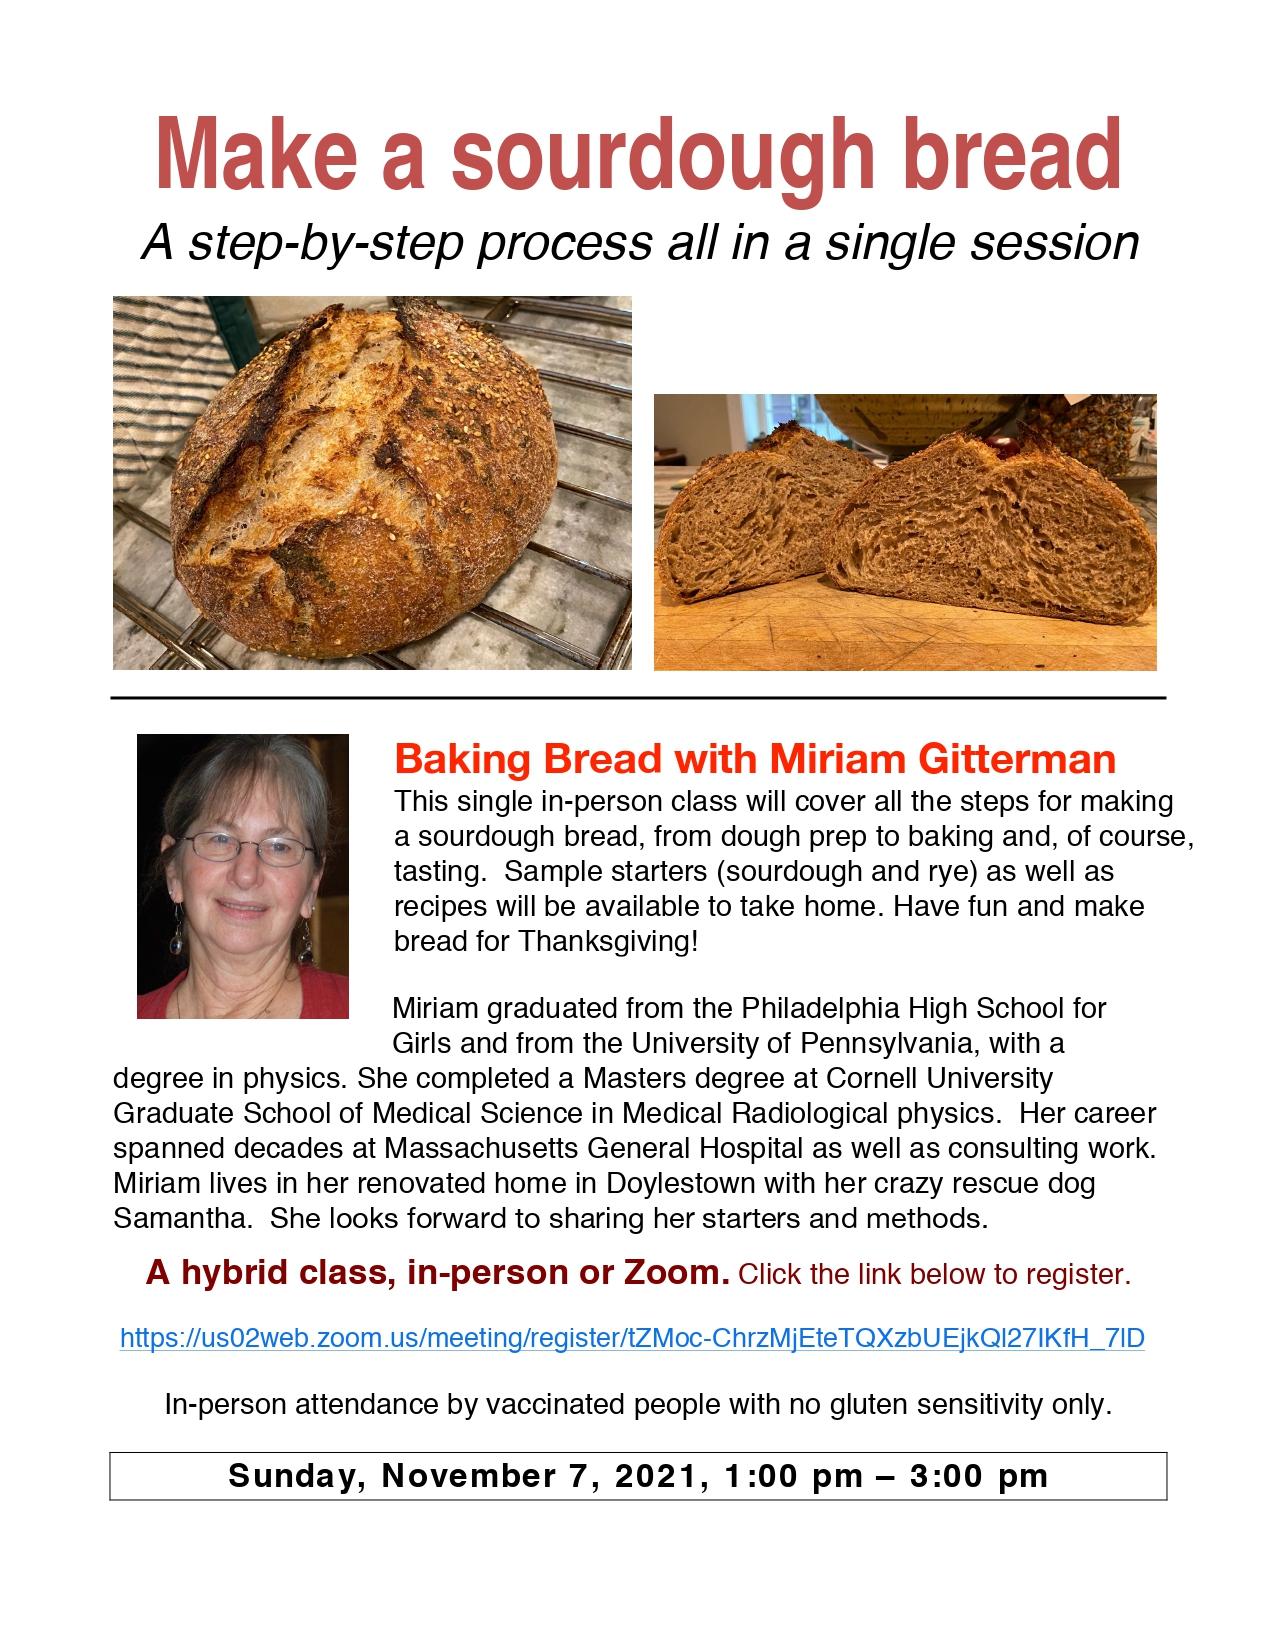 Banner Image for Make Sourdough Bread